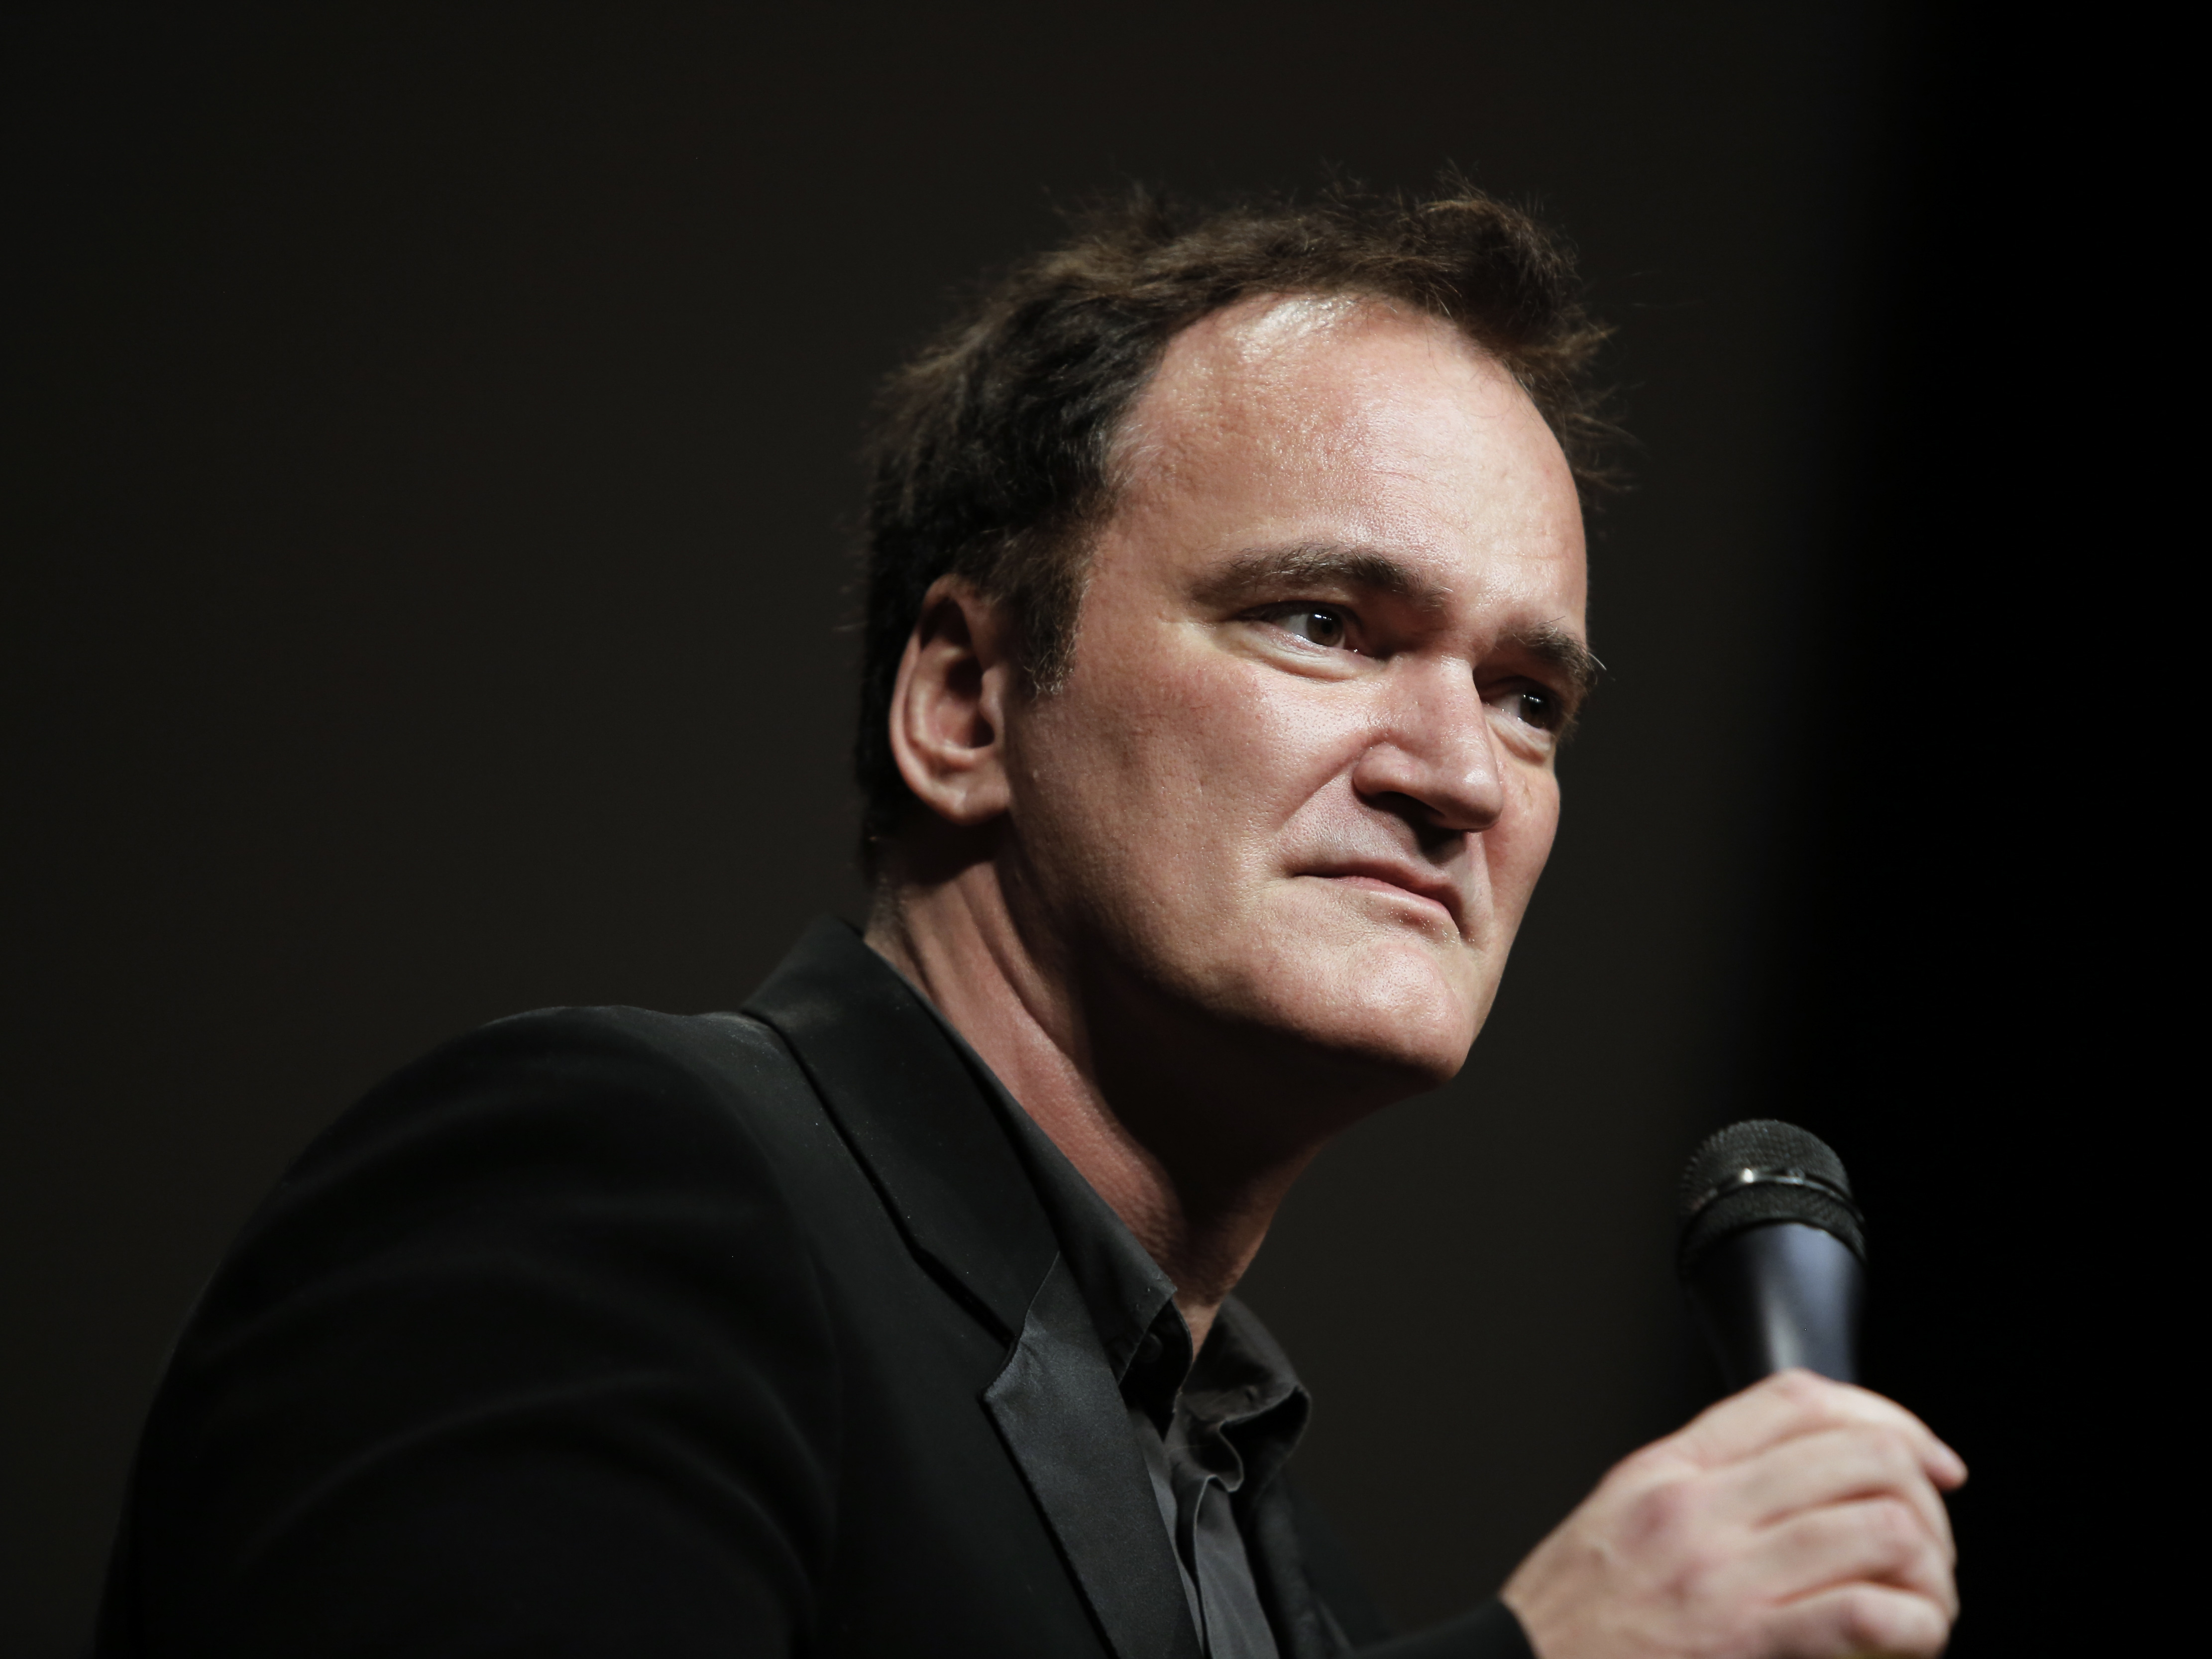 Photo: Quentin Tarantino (AP Photo)